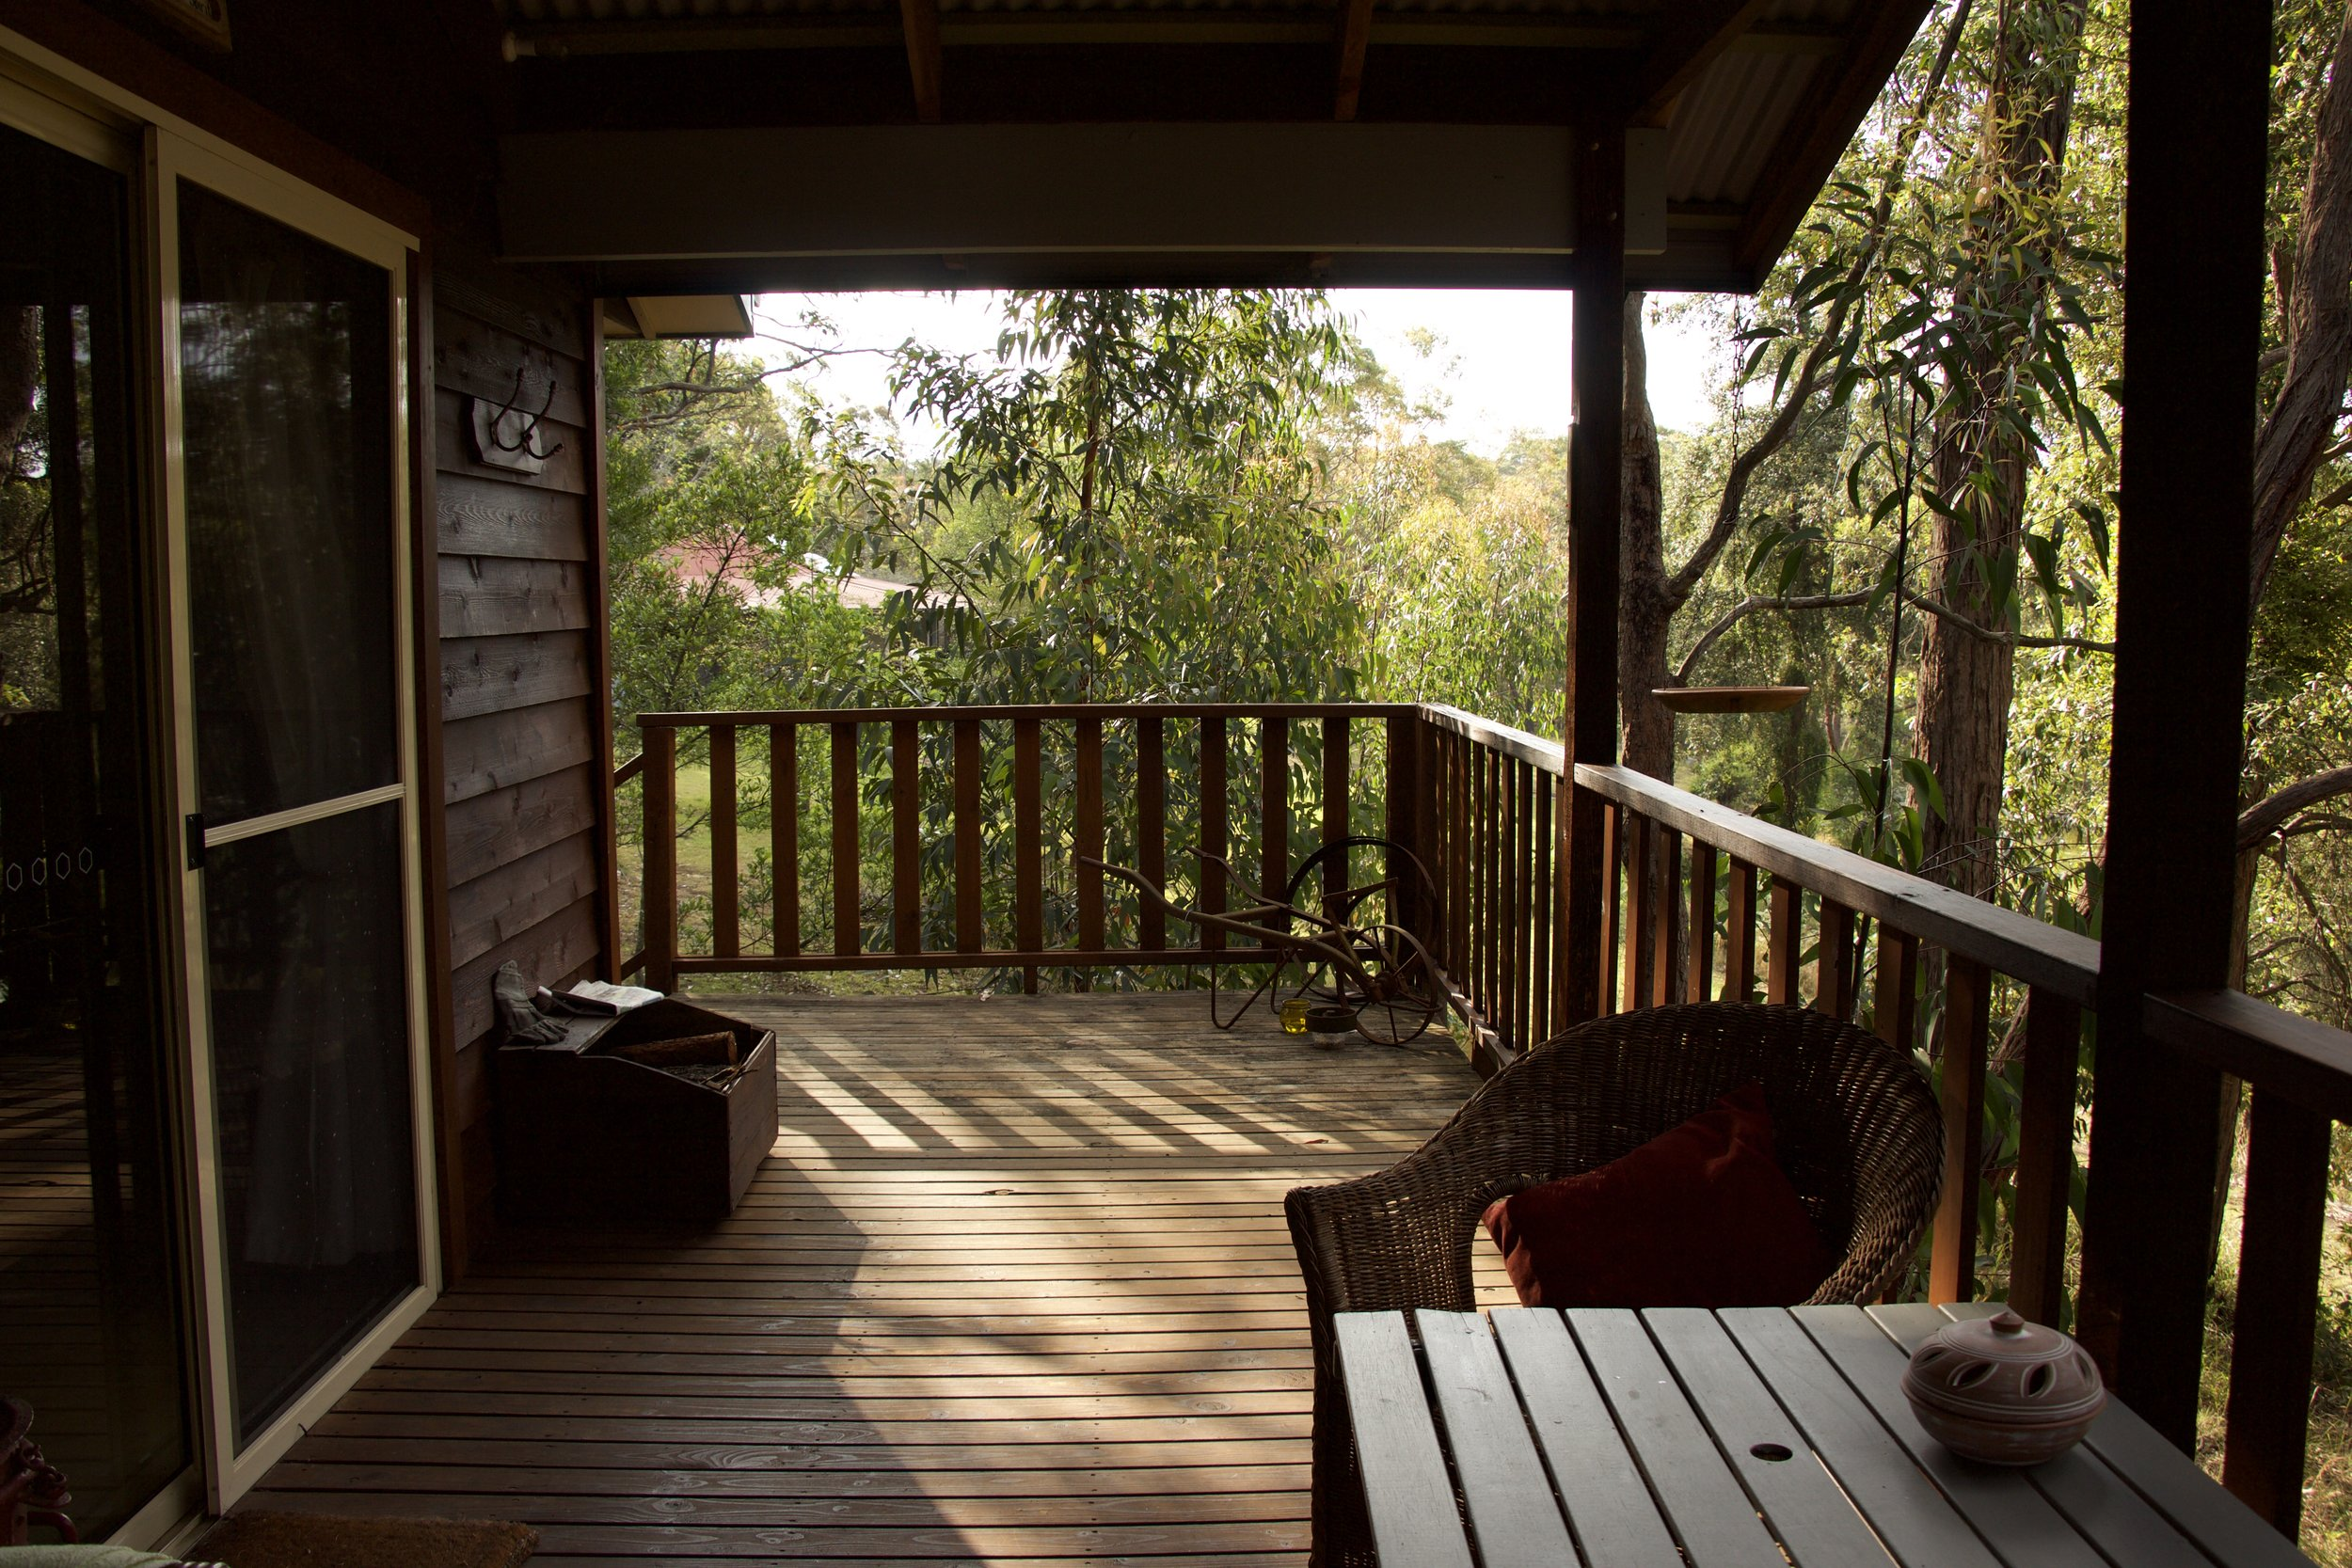 bushland bungalow - paddock